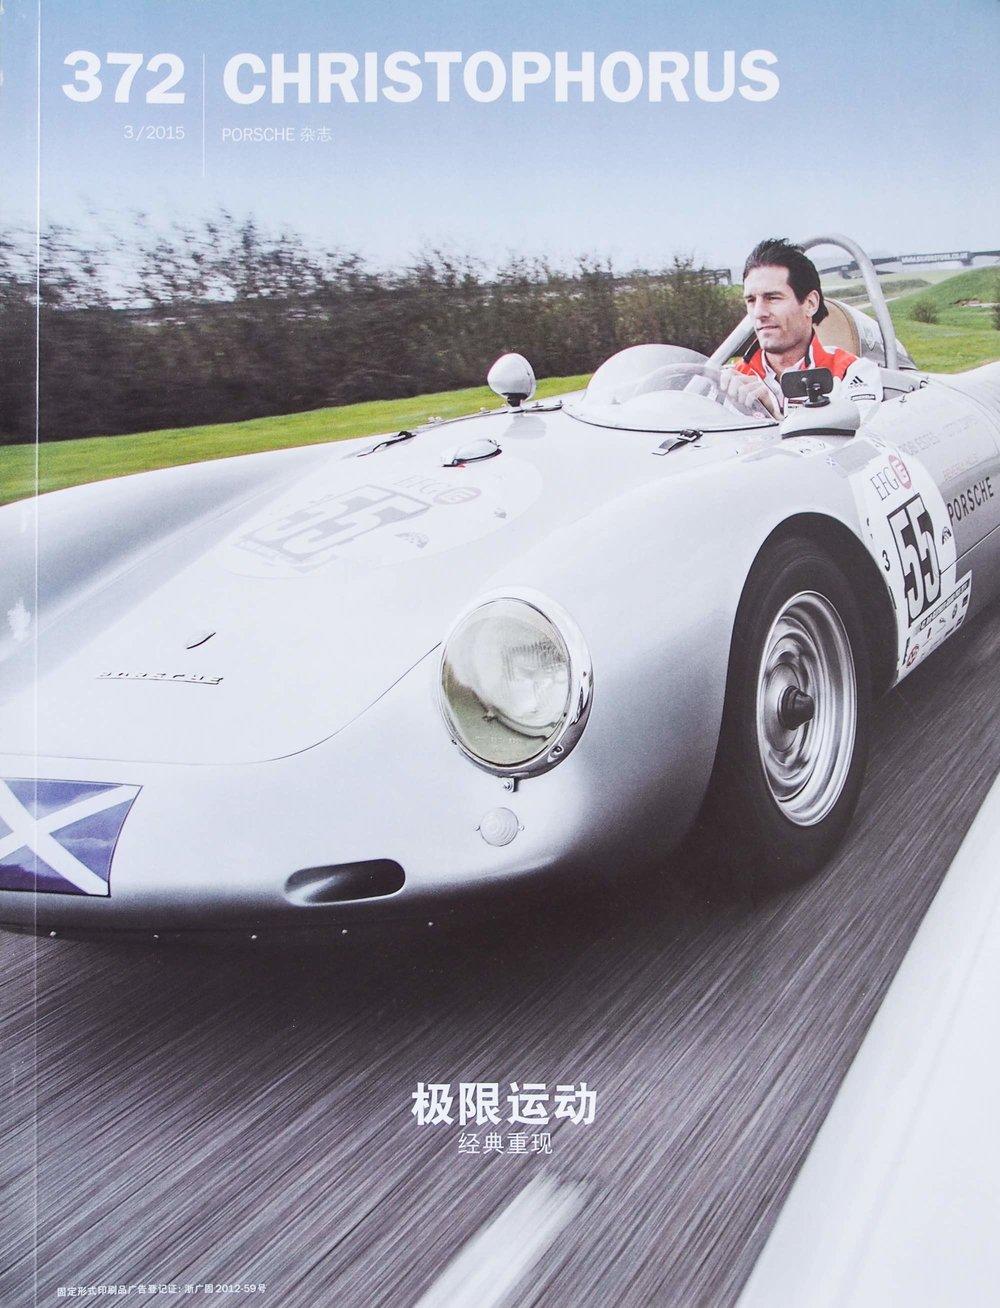 Christophorus 201503_Porsche_1.jpg